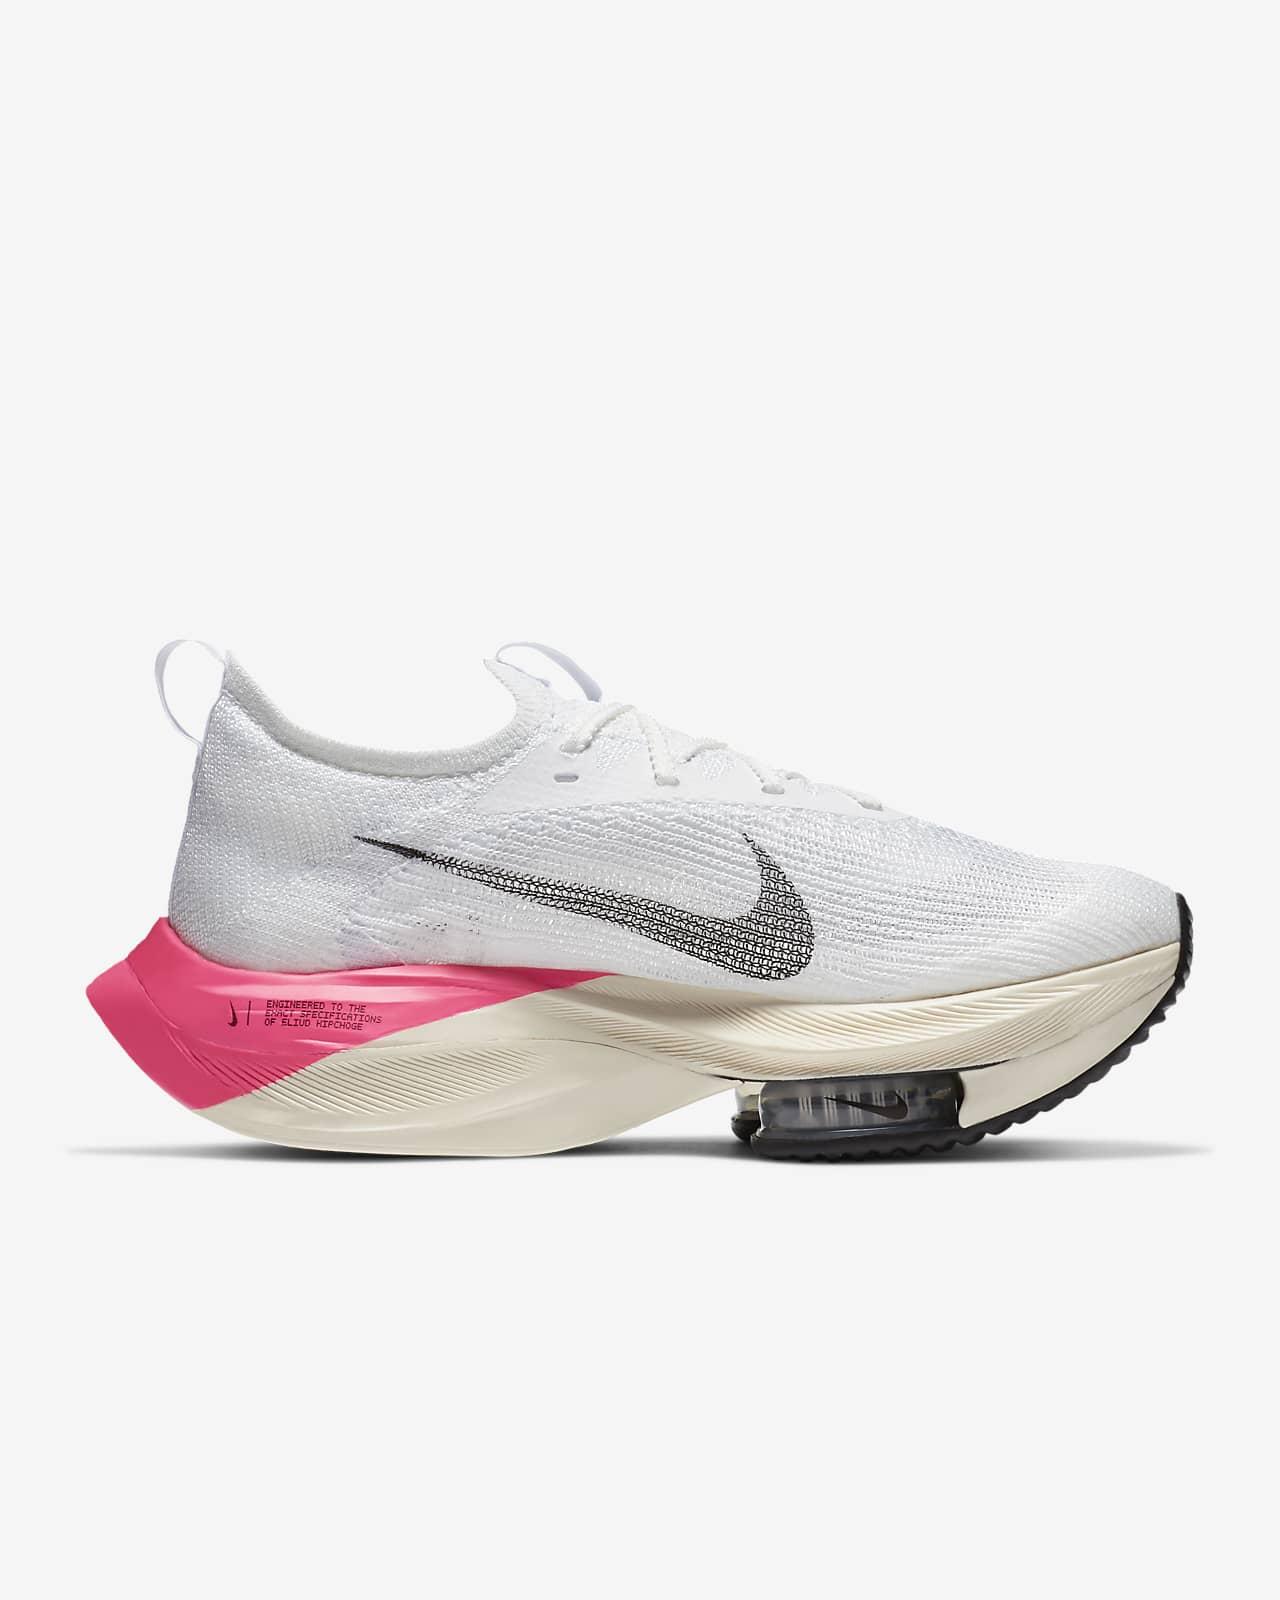 dolor de muelas tarifa Refinar  Nike Air Zoom Alphafly Next% Eliud Kipchoge Women's Racing Shoe. Nike GB